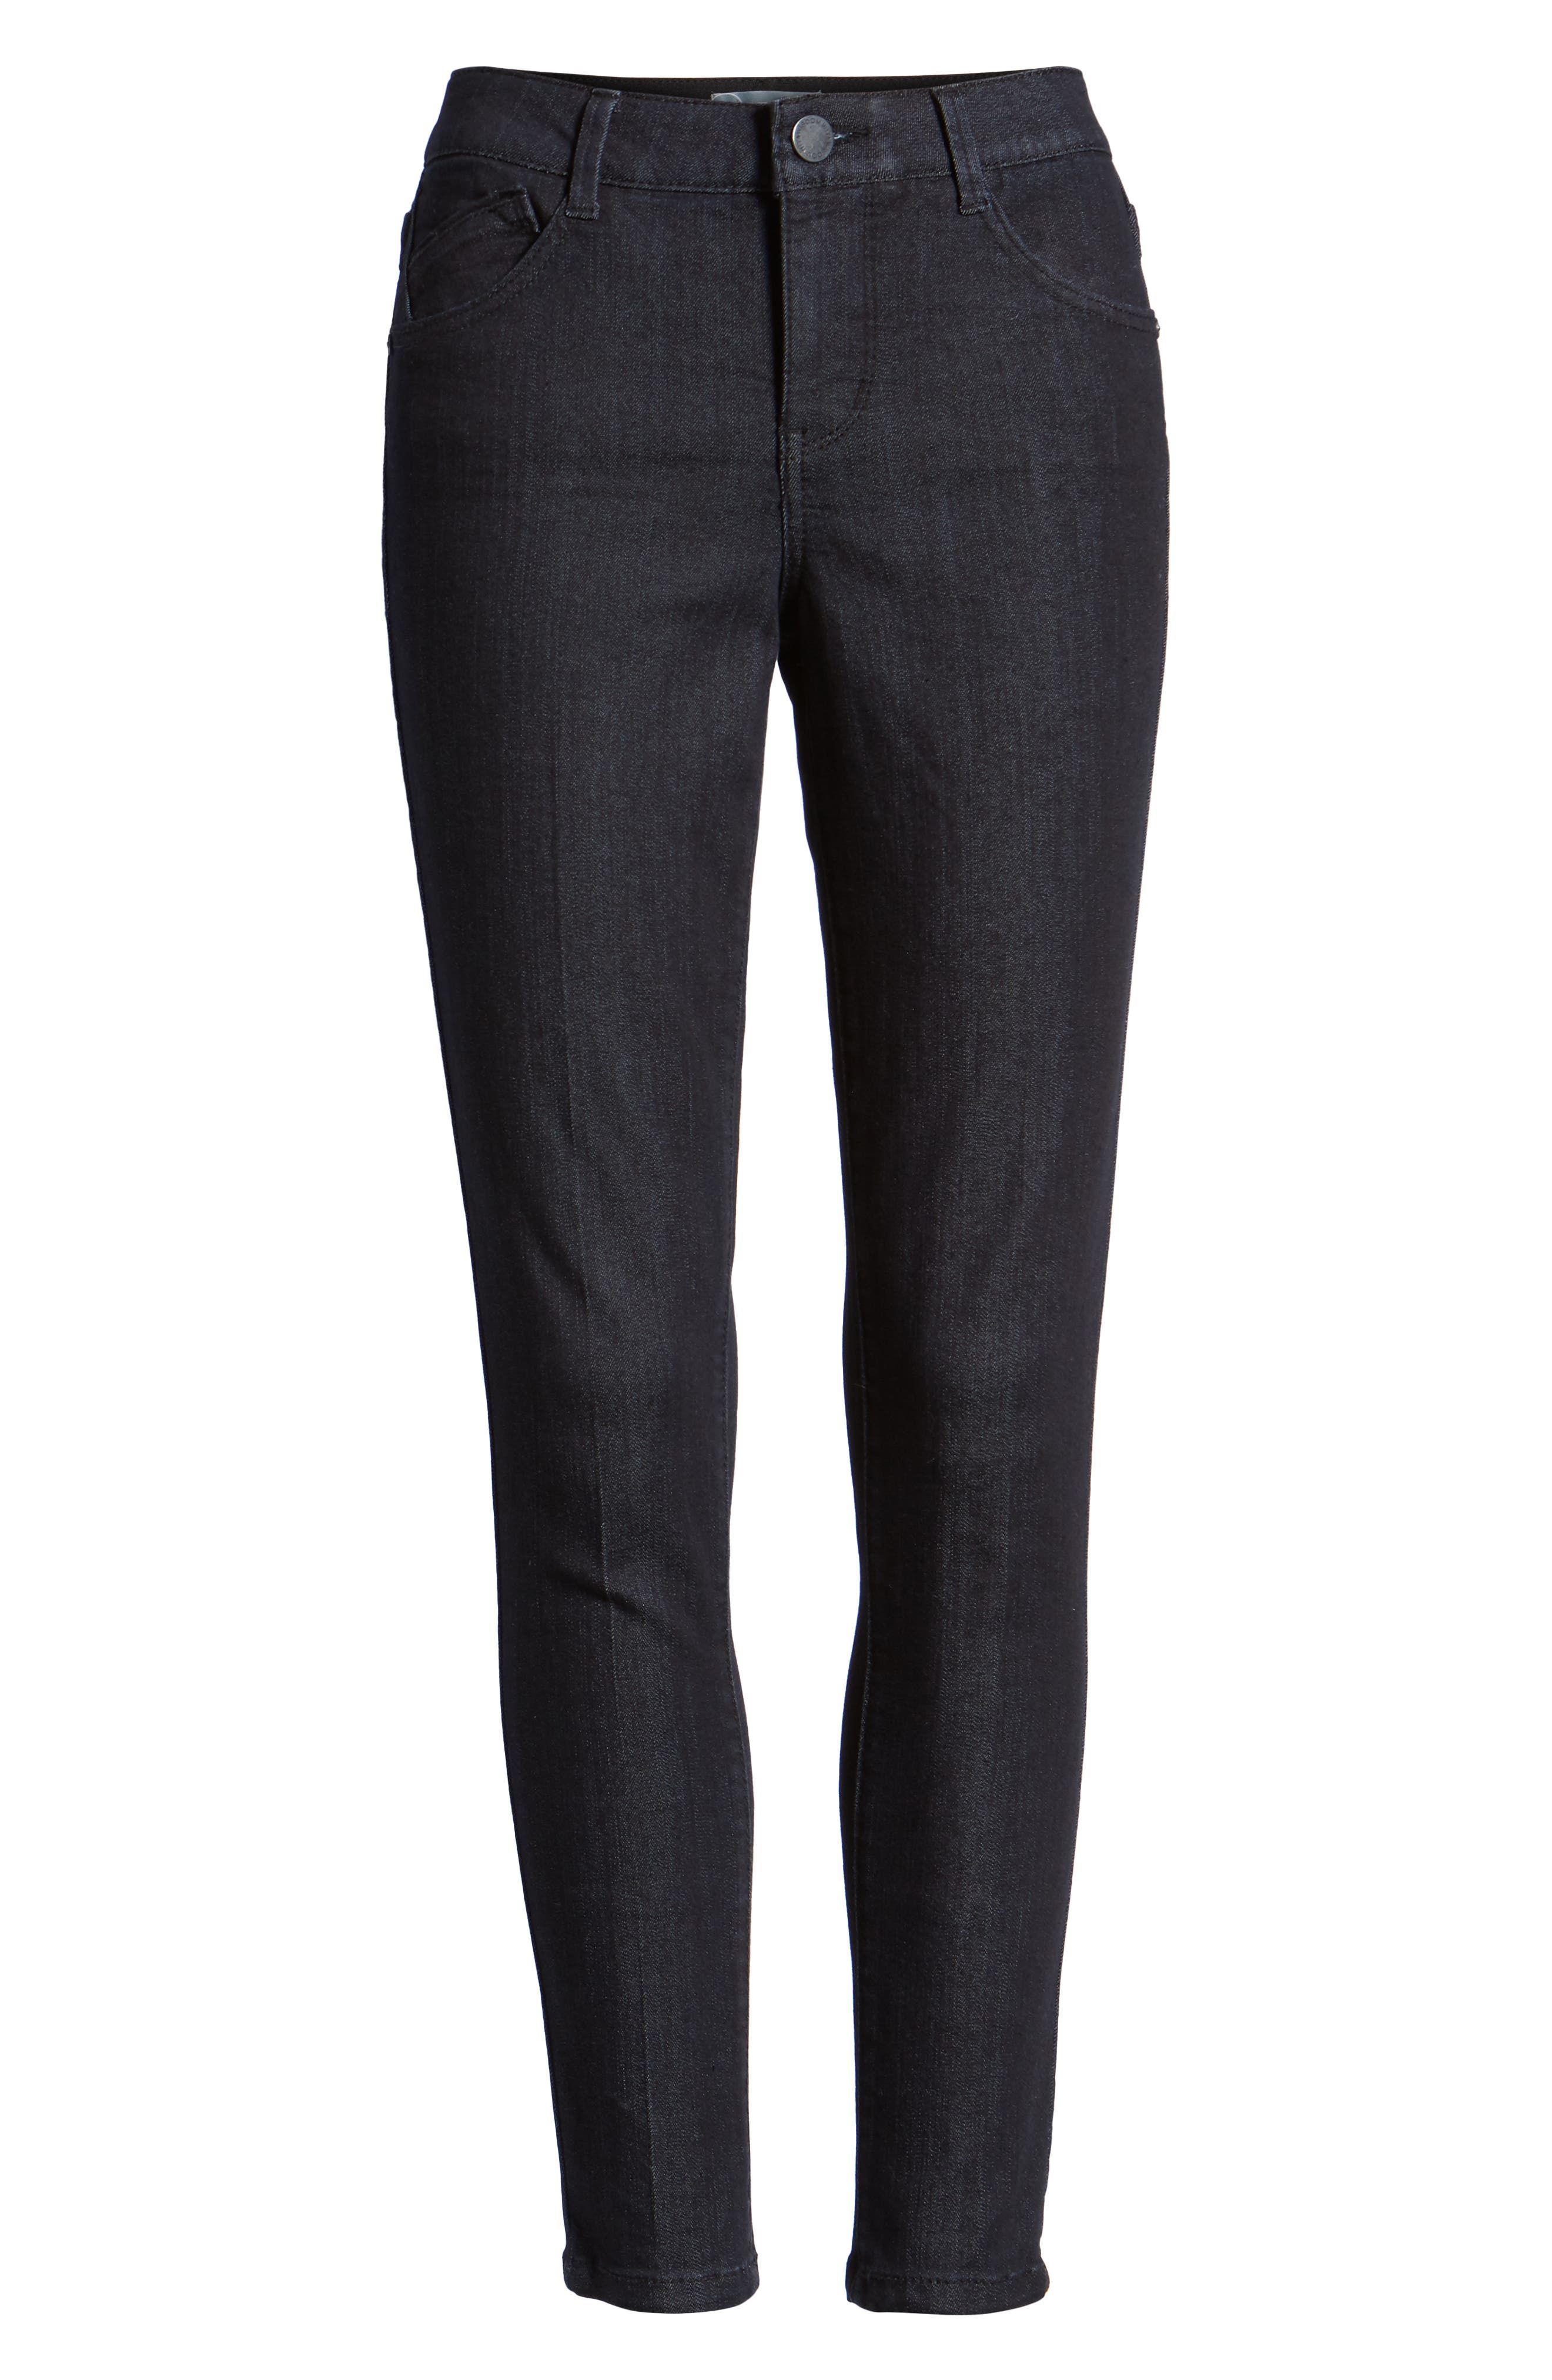 Ab-solution Ankle Skinny Jeans,                             Alternate thumbnail 7, color,                             INDIGO